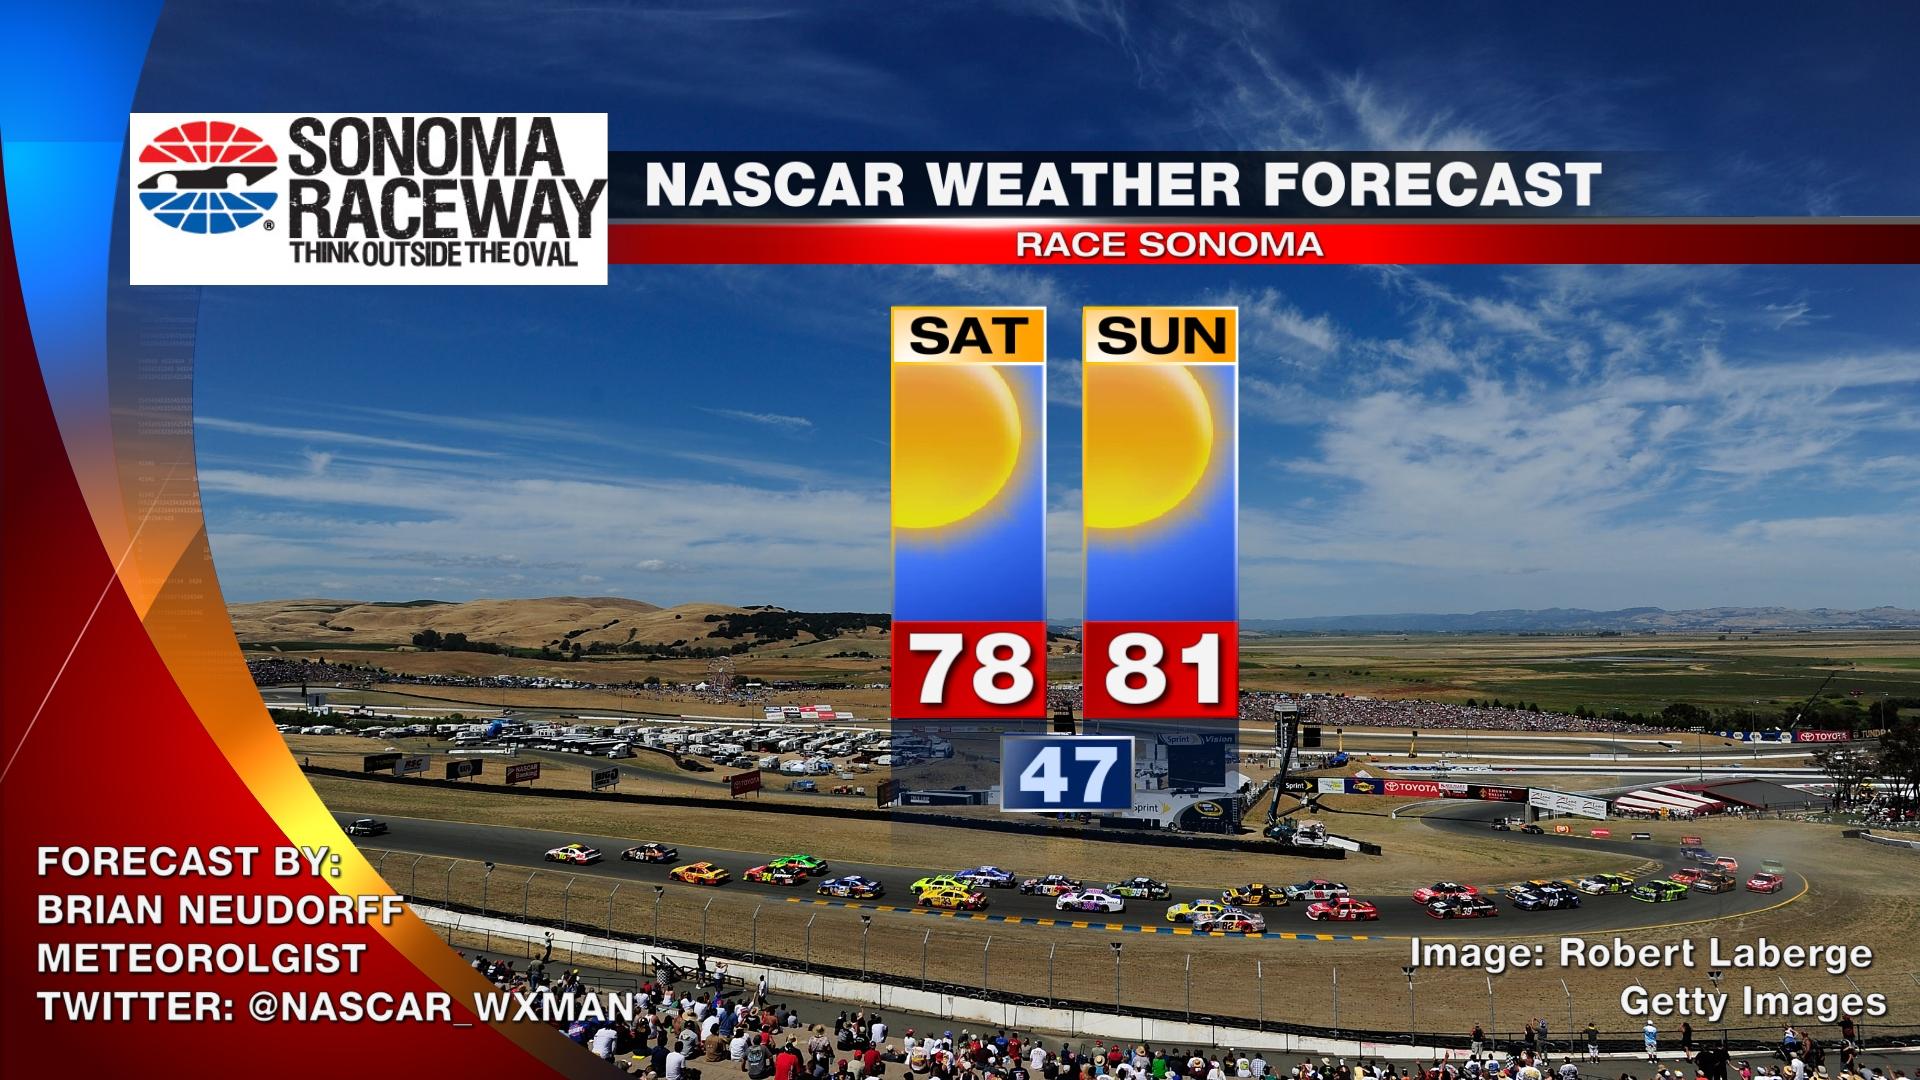 2014 NASCAR At Sonoma weekend weather forecast